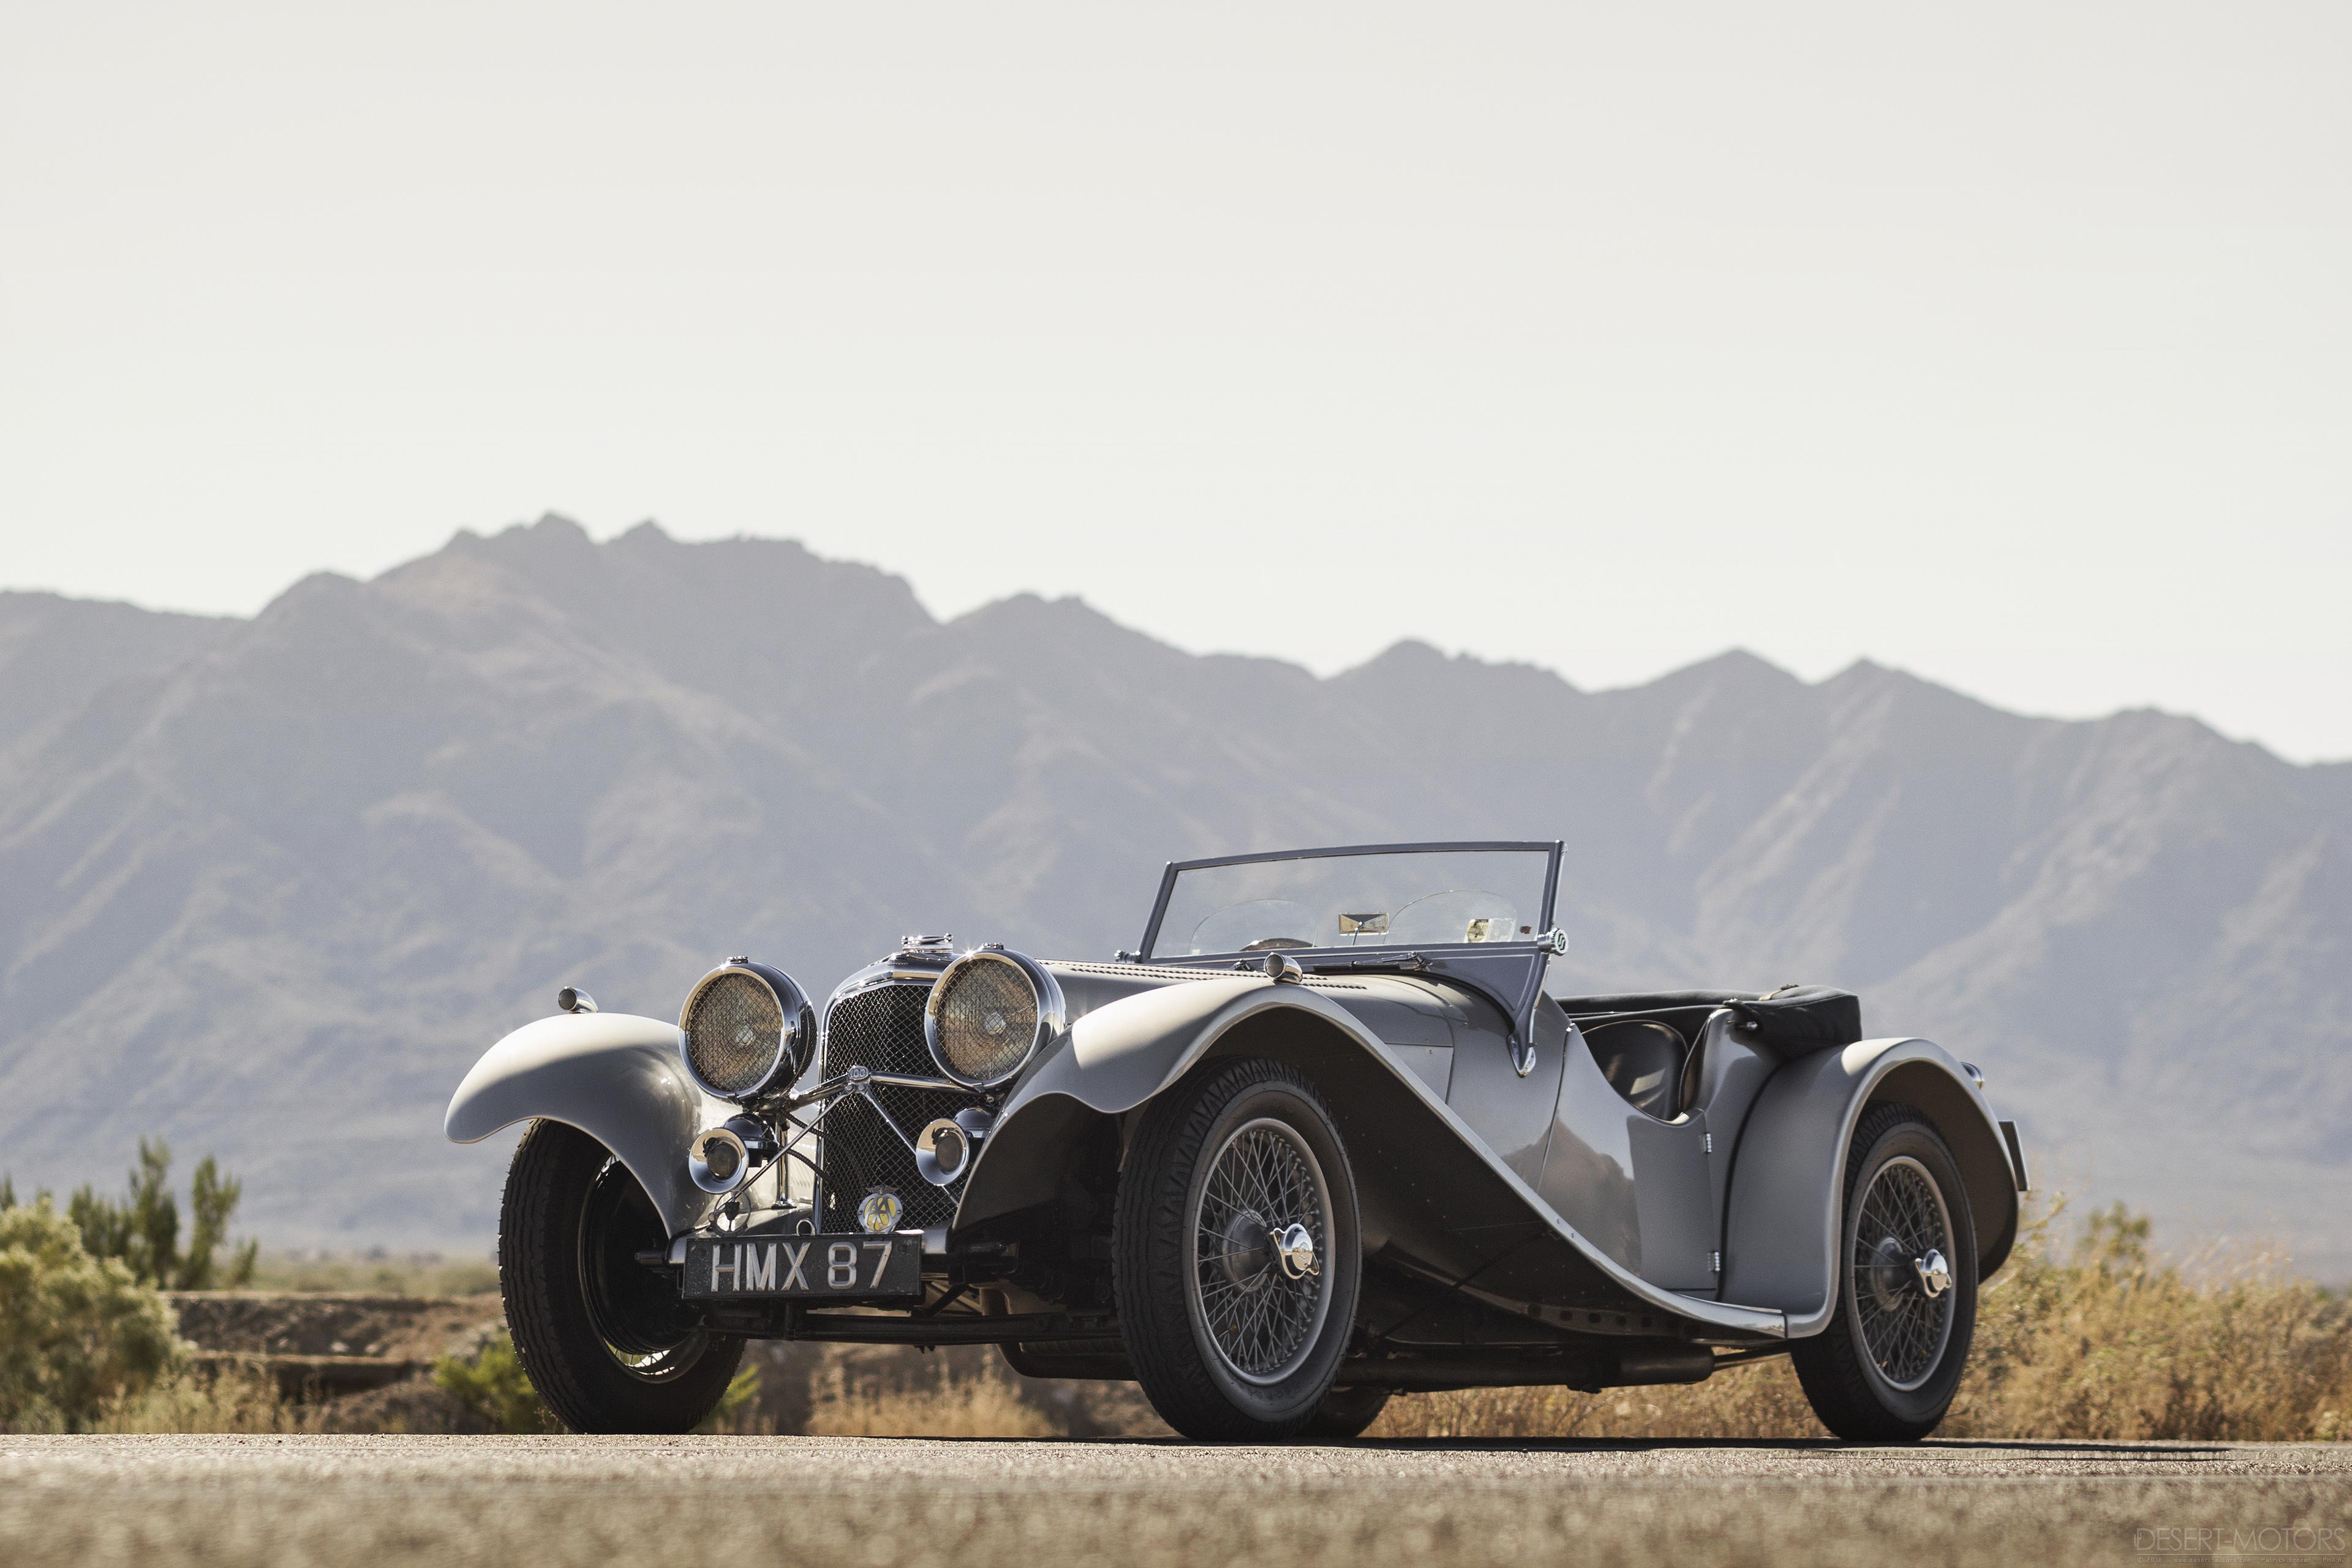 1938 Ss 100 Jaguar 3 189 Litre Roadster Desert Motors Com